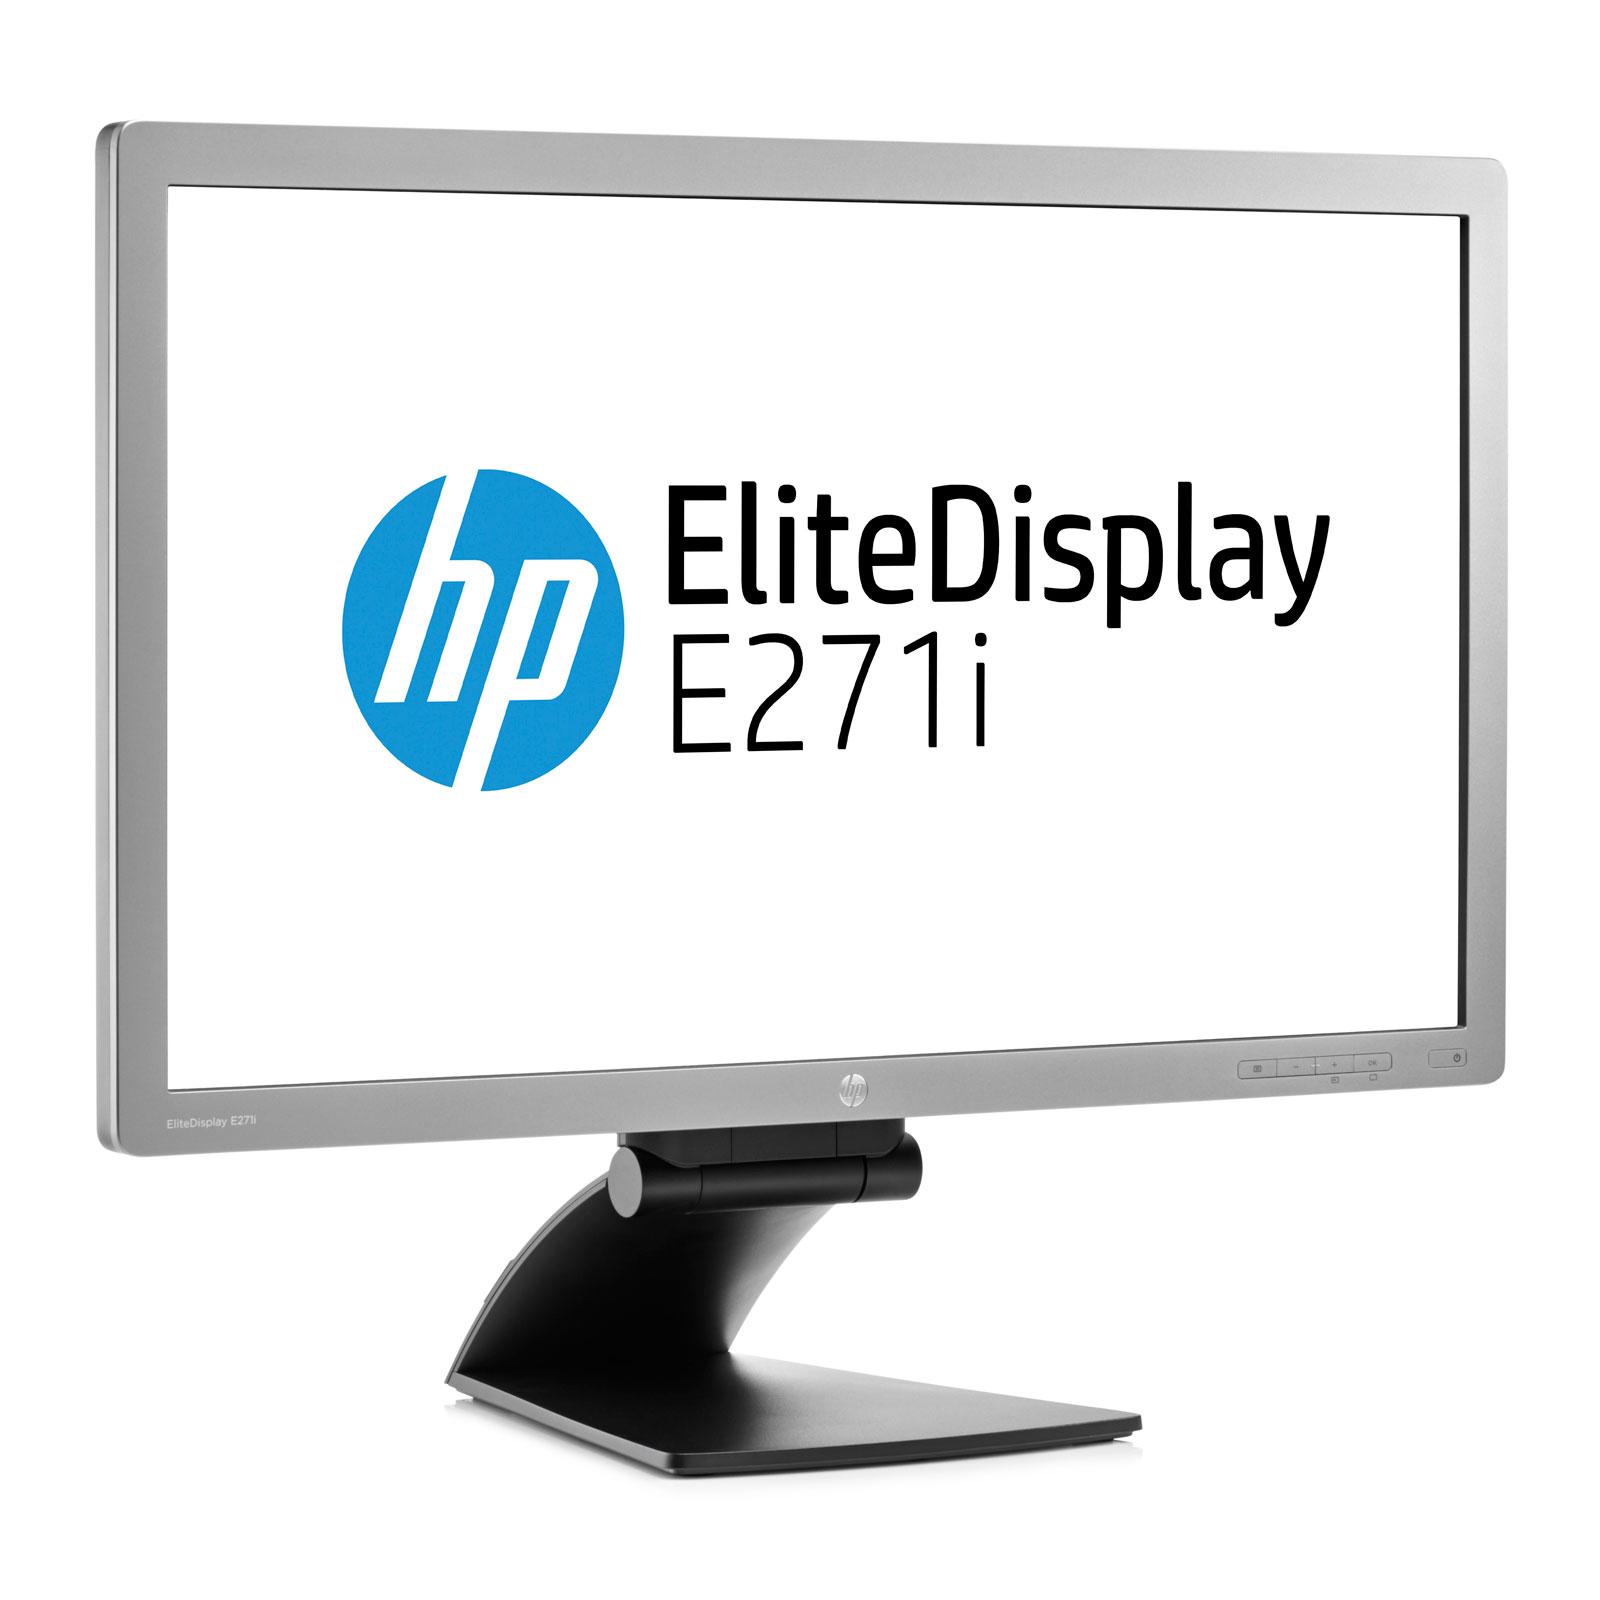 "Ecran PC HP 27"" LED - EliteDisplay E271i (D7Z72AT)  1920 x 1080 pixels - 7 ms - Format large 16/9 - Dalle IPS - DisplayPort - Hub USB - Noir"